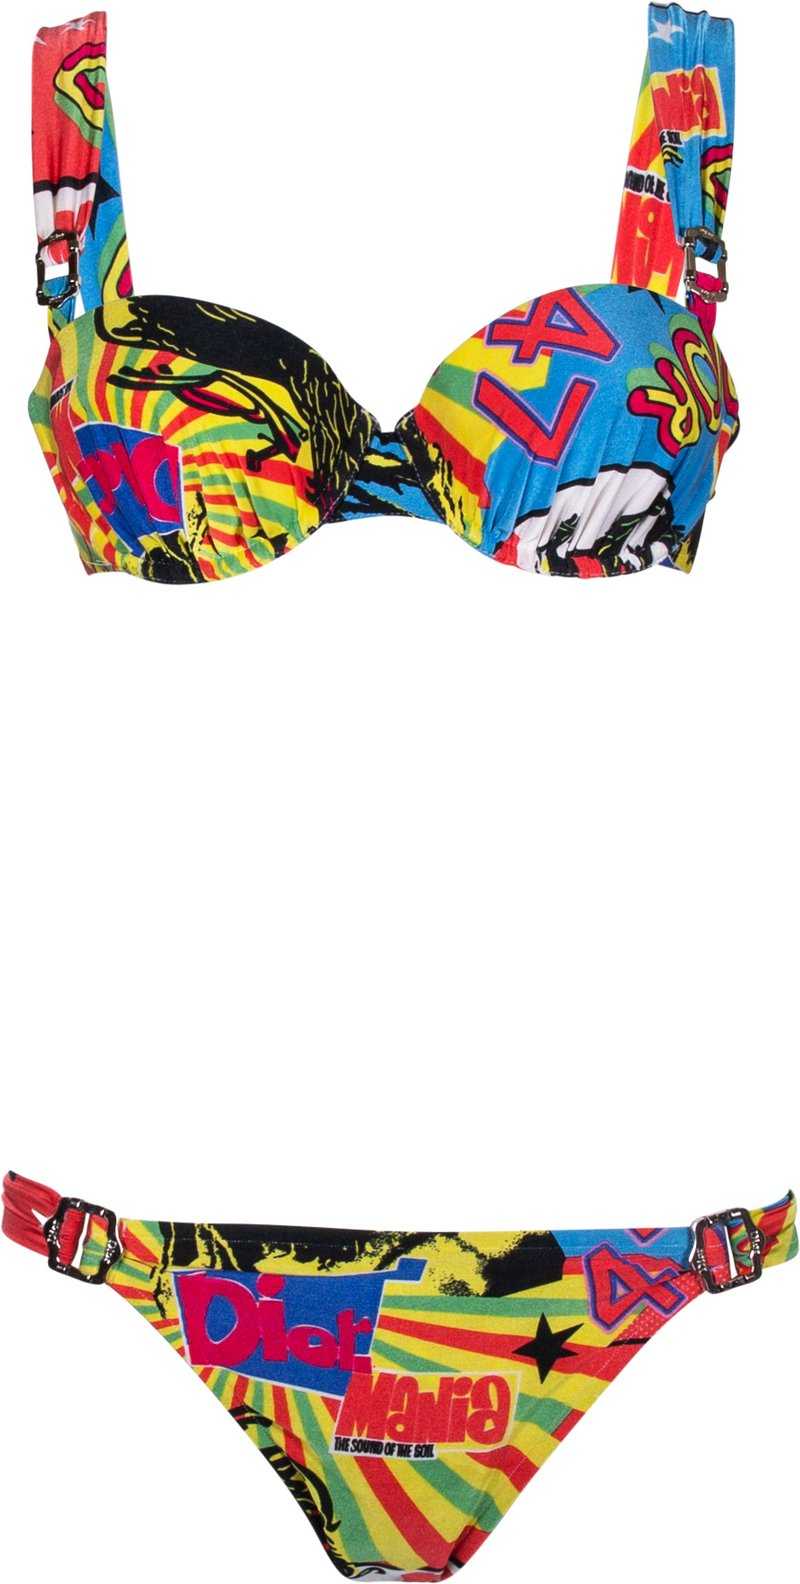 Kourtney Kardashian wearing Skimpy multicolor graphic print bikini bottom by Dior